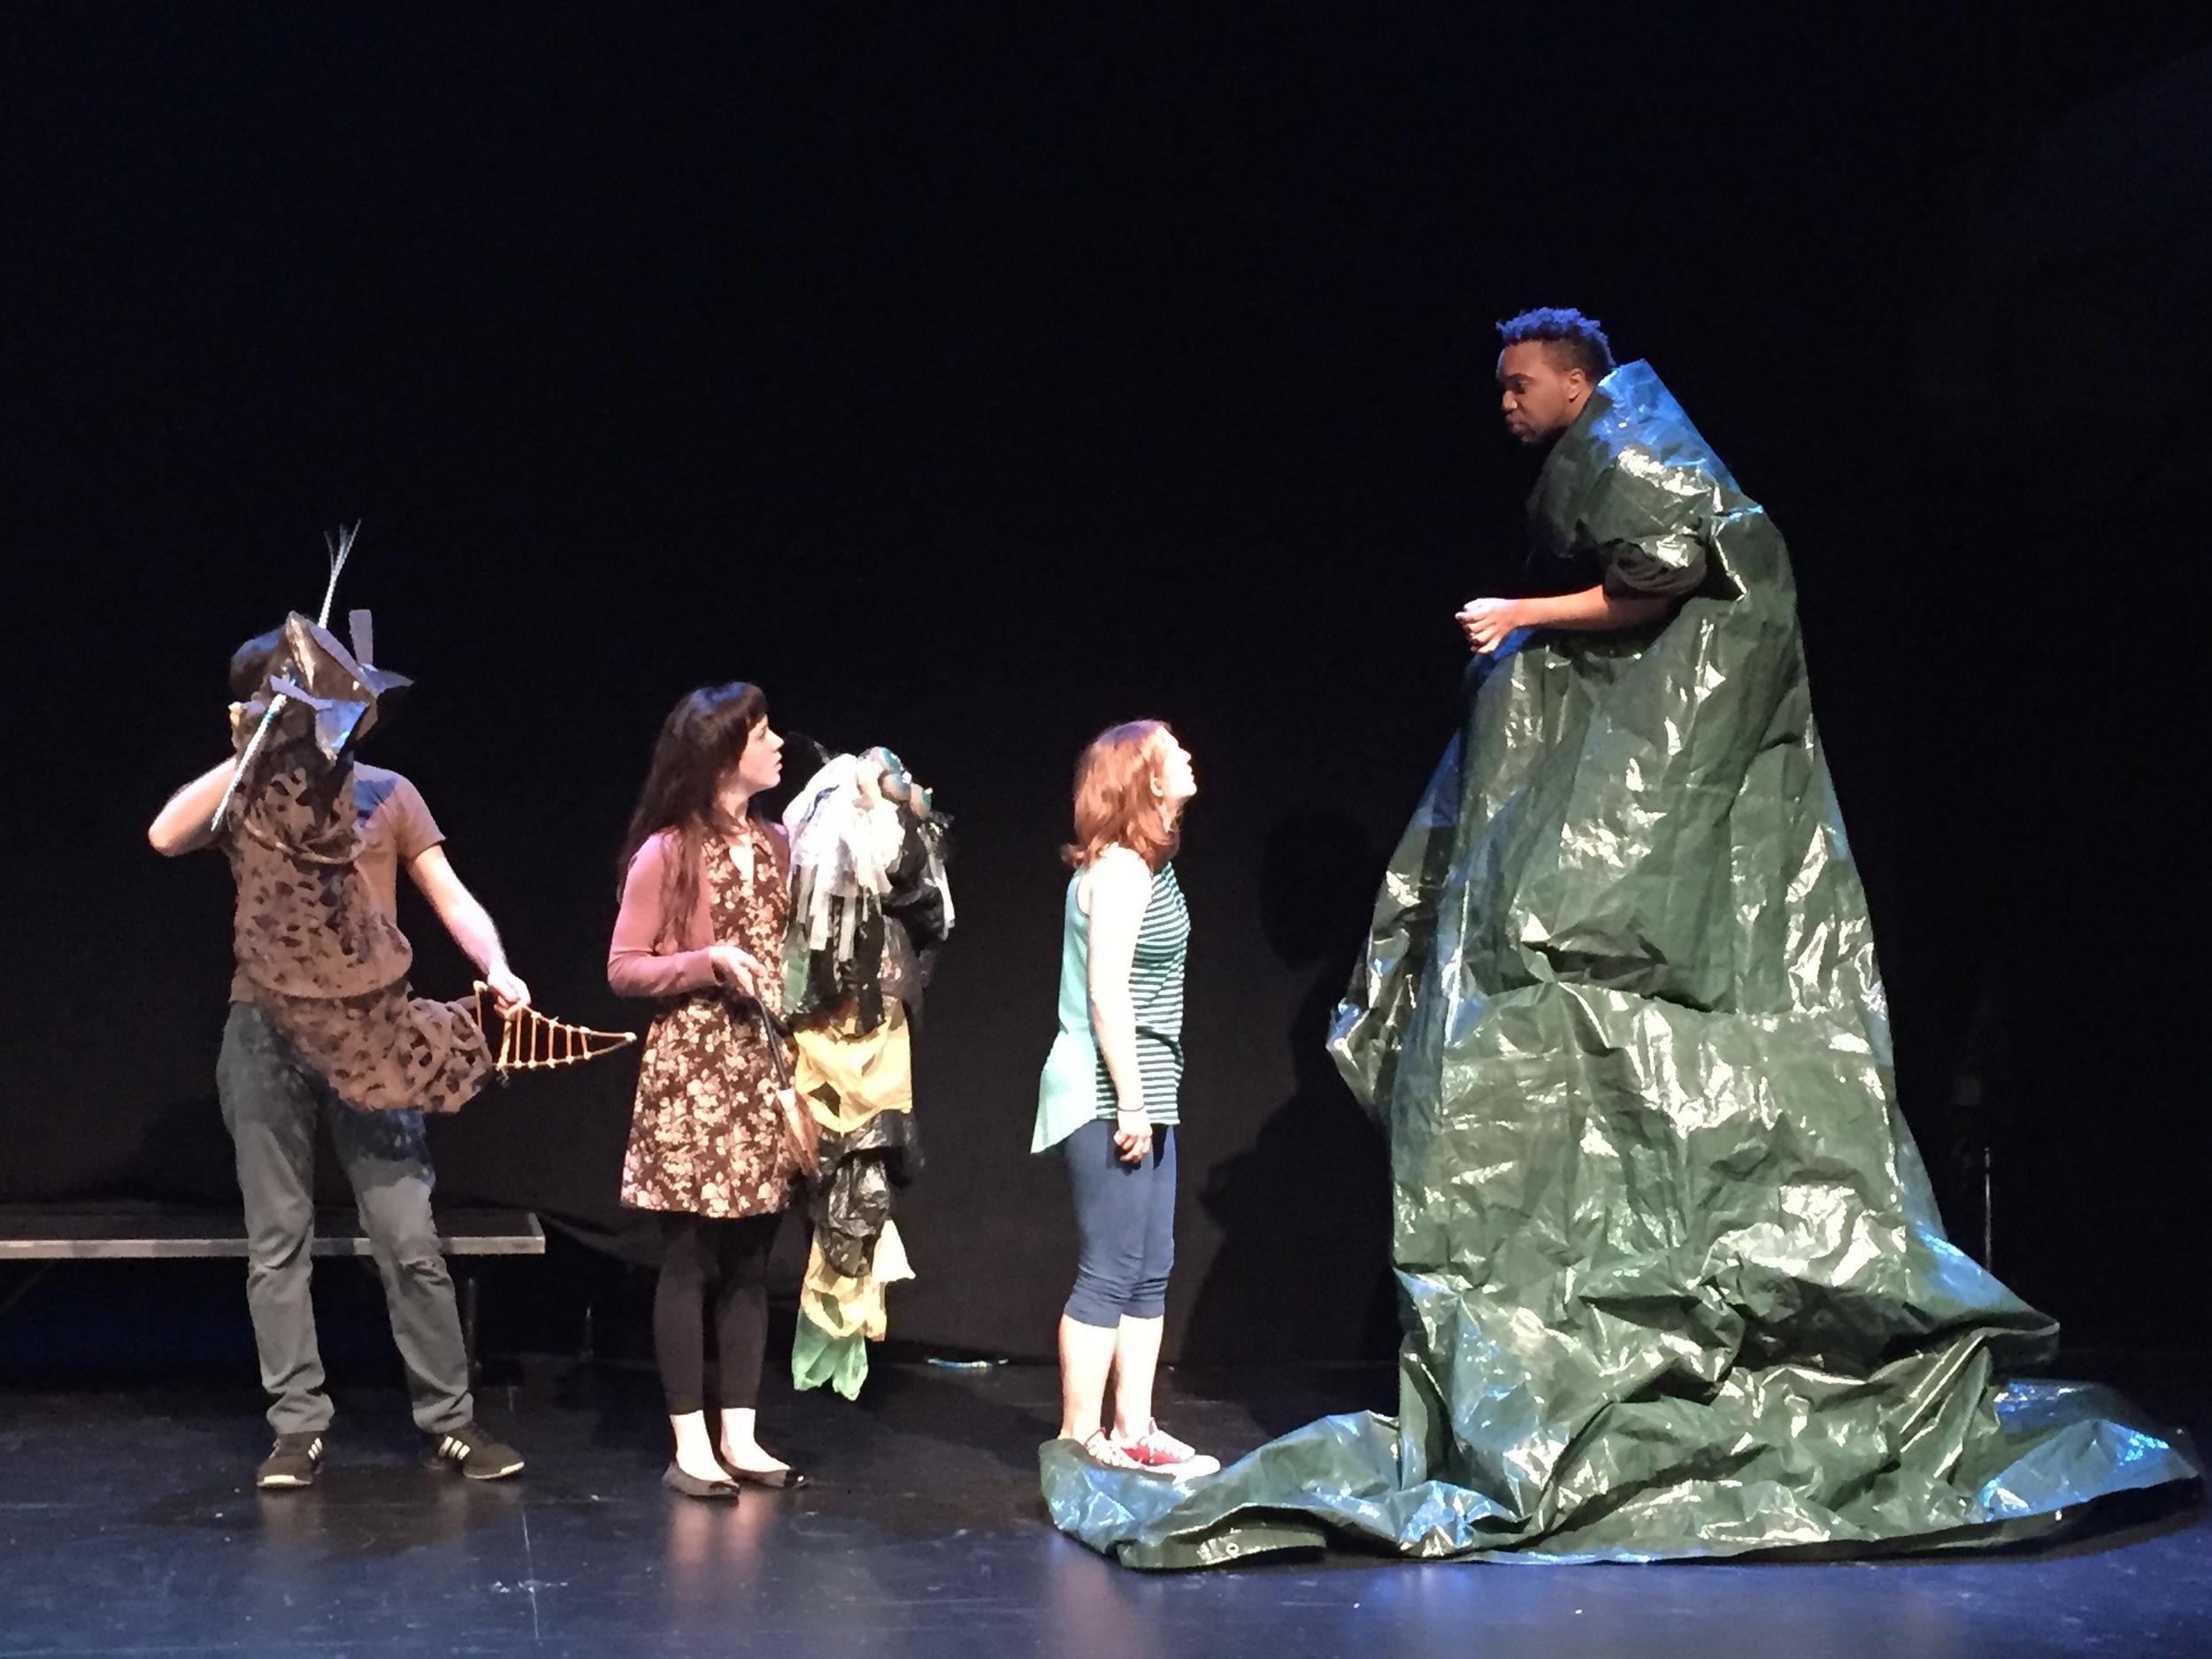 L to R: Richard Saudek, Amelia Pedlow, Emily Walton and Jordan Barbour in a June 2015 developmental open rehearsal. Puppets by Amanda Villalobos.